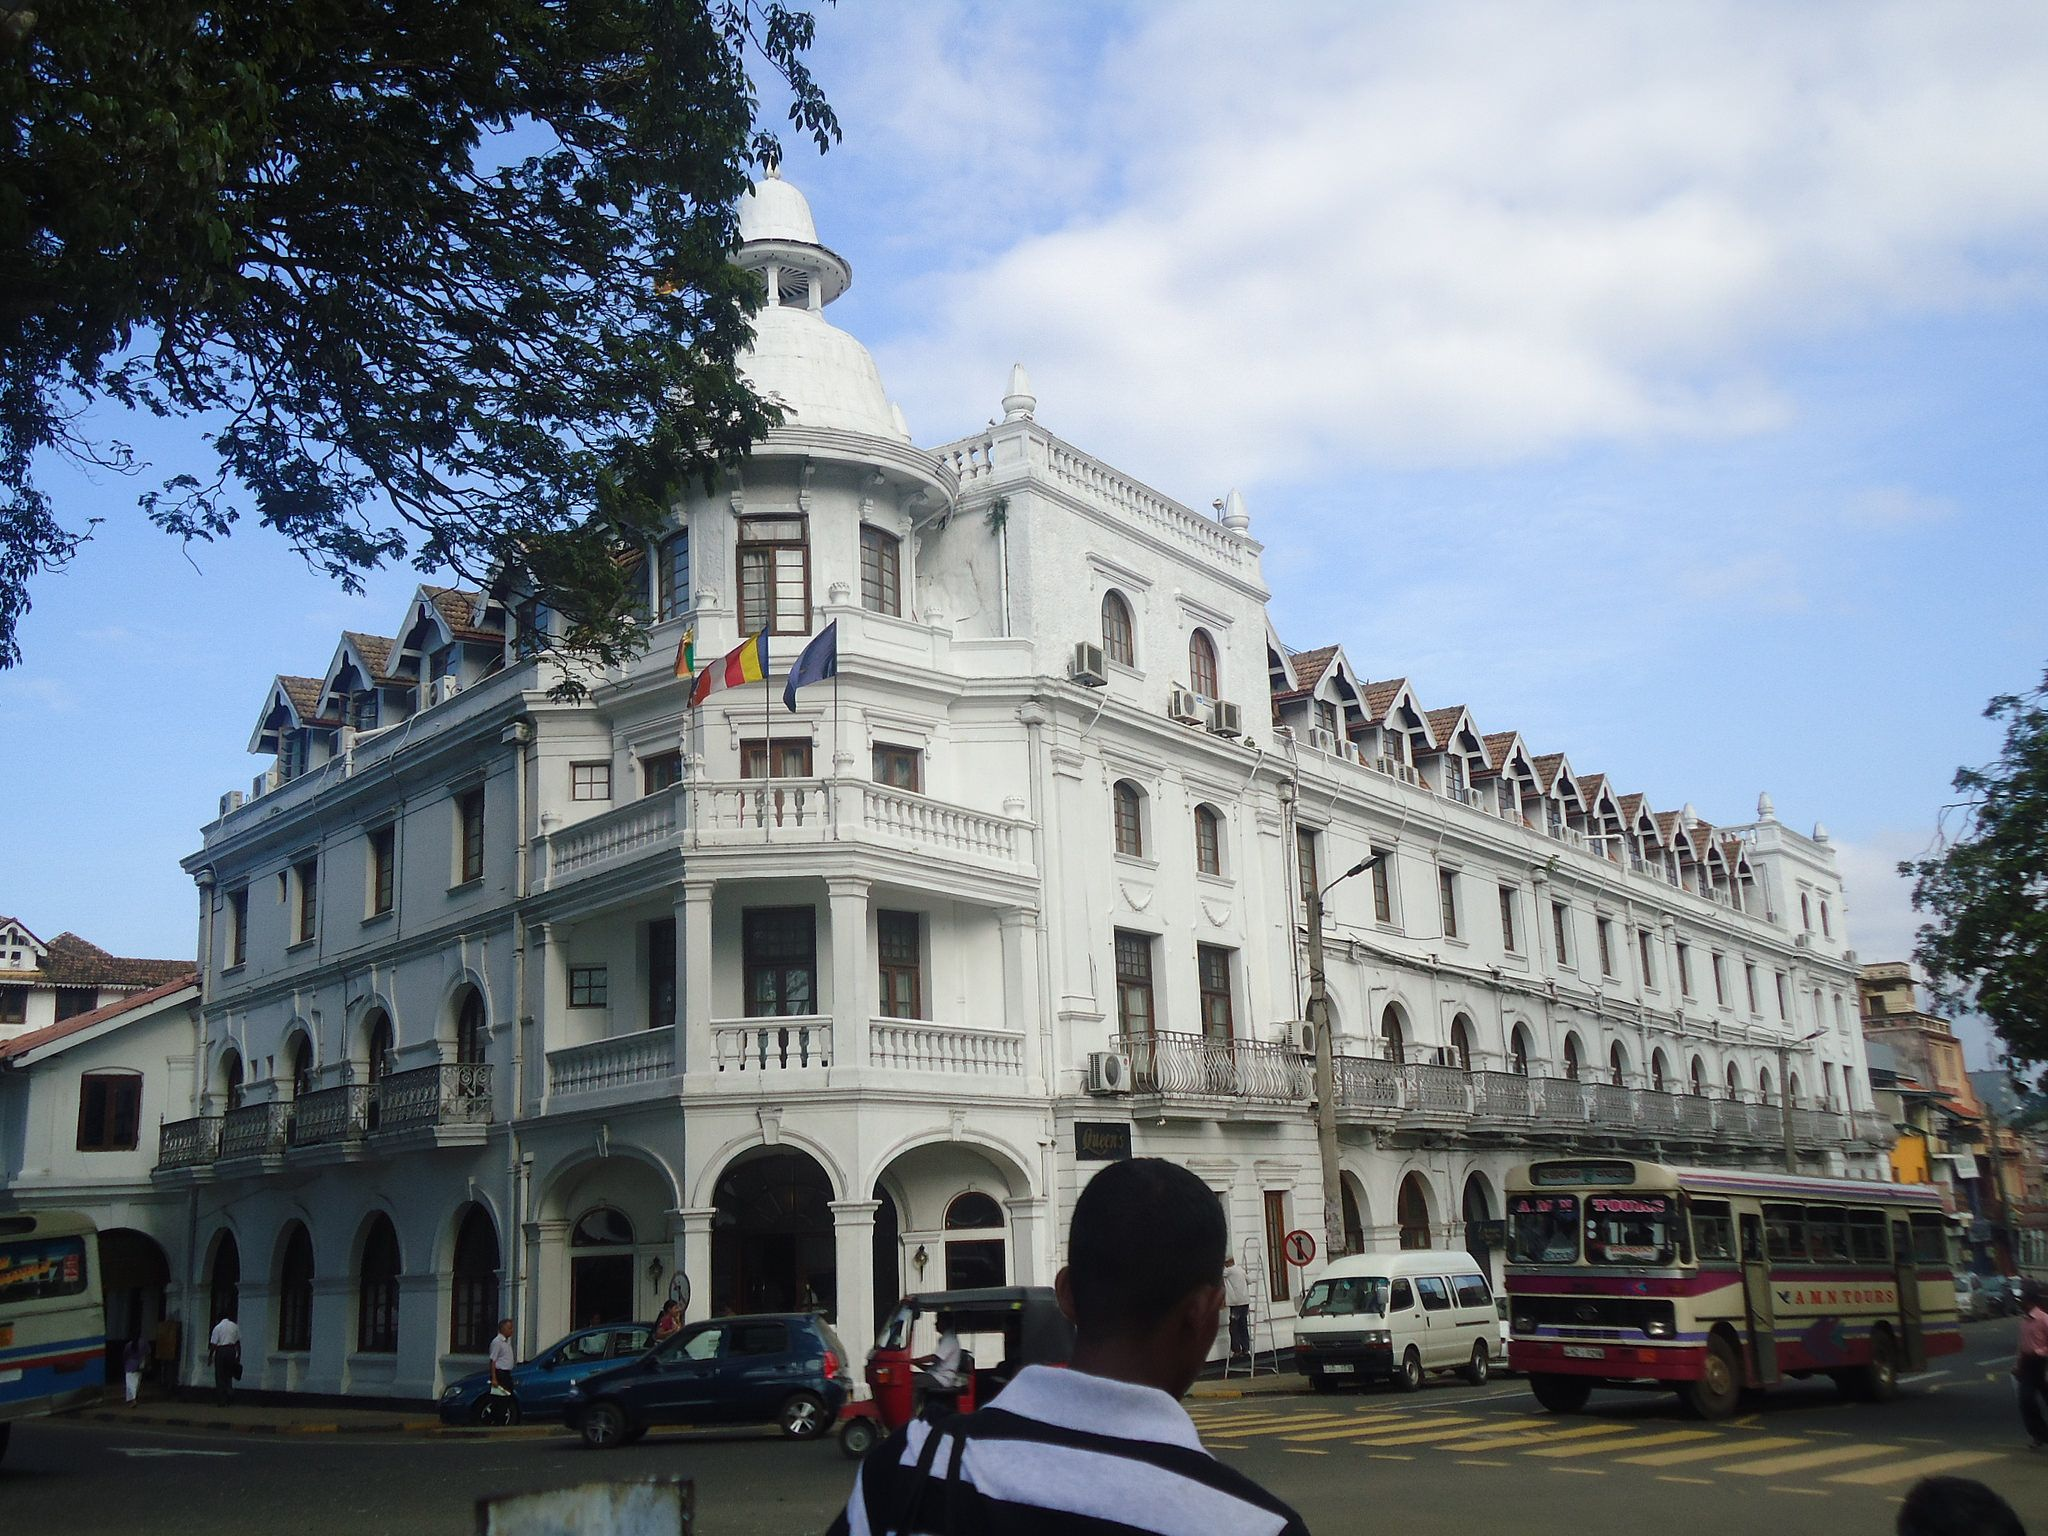 Https Flic Kr P Khewkz Queens Hotel Kandy 1 Queens Hotel